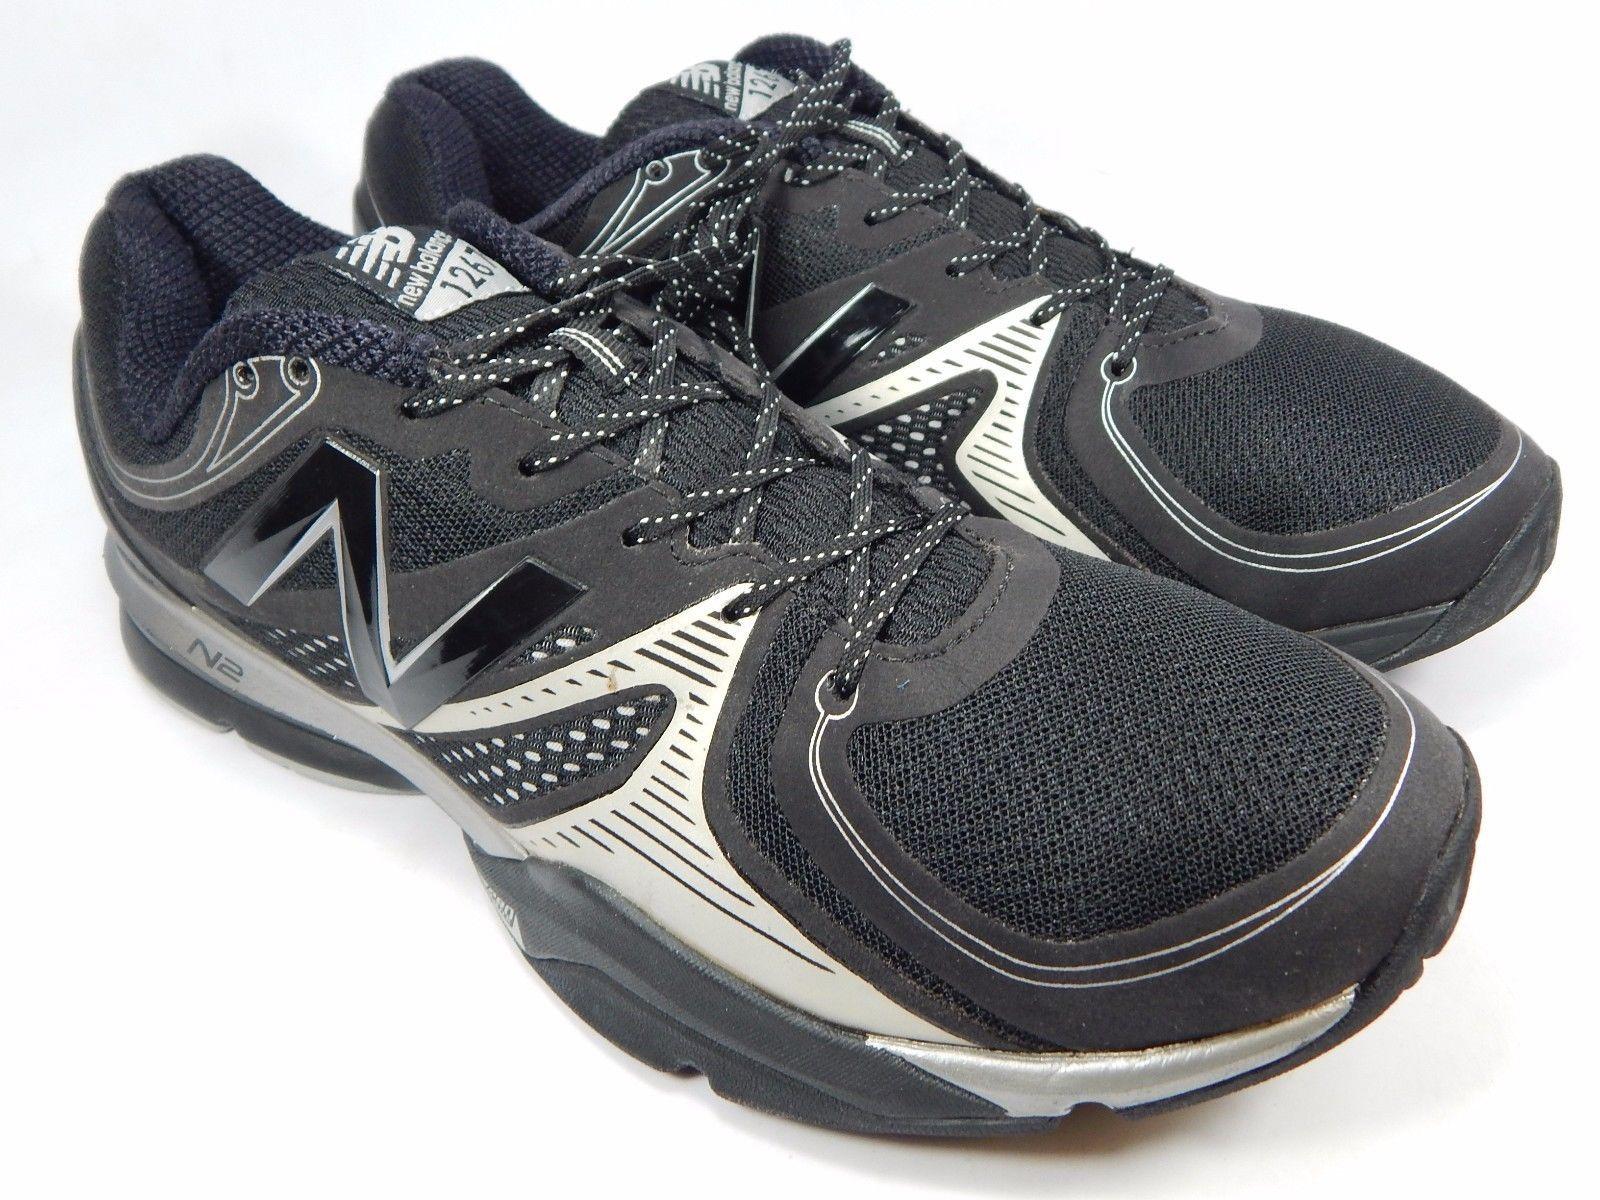 New Balance 1267 Men's Cross Training Shoes Size US 11.5 M (D) EU 45.5 MX1267BK